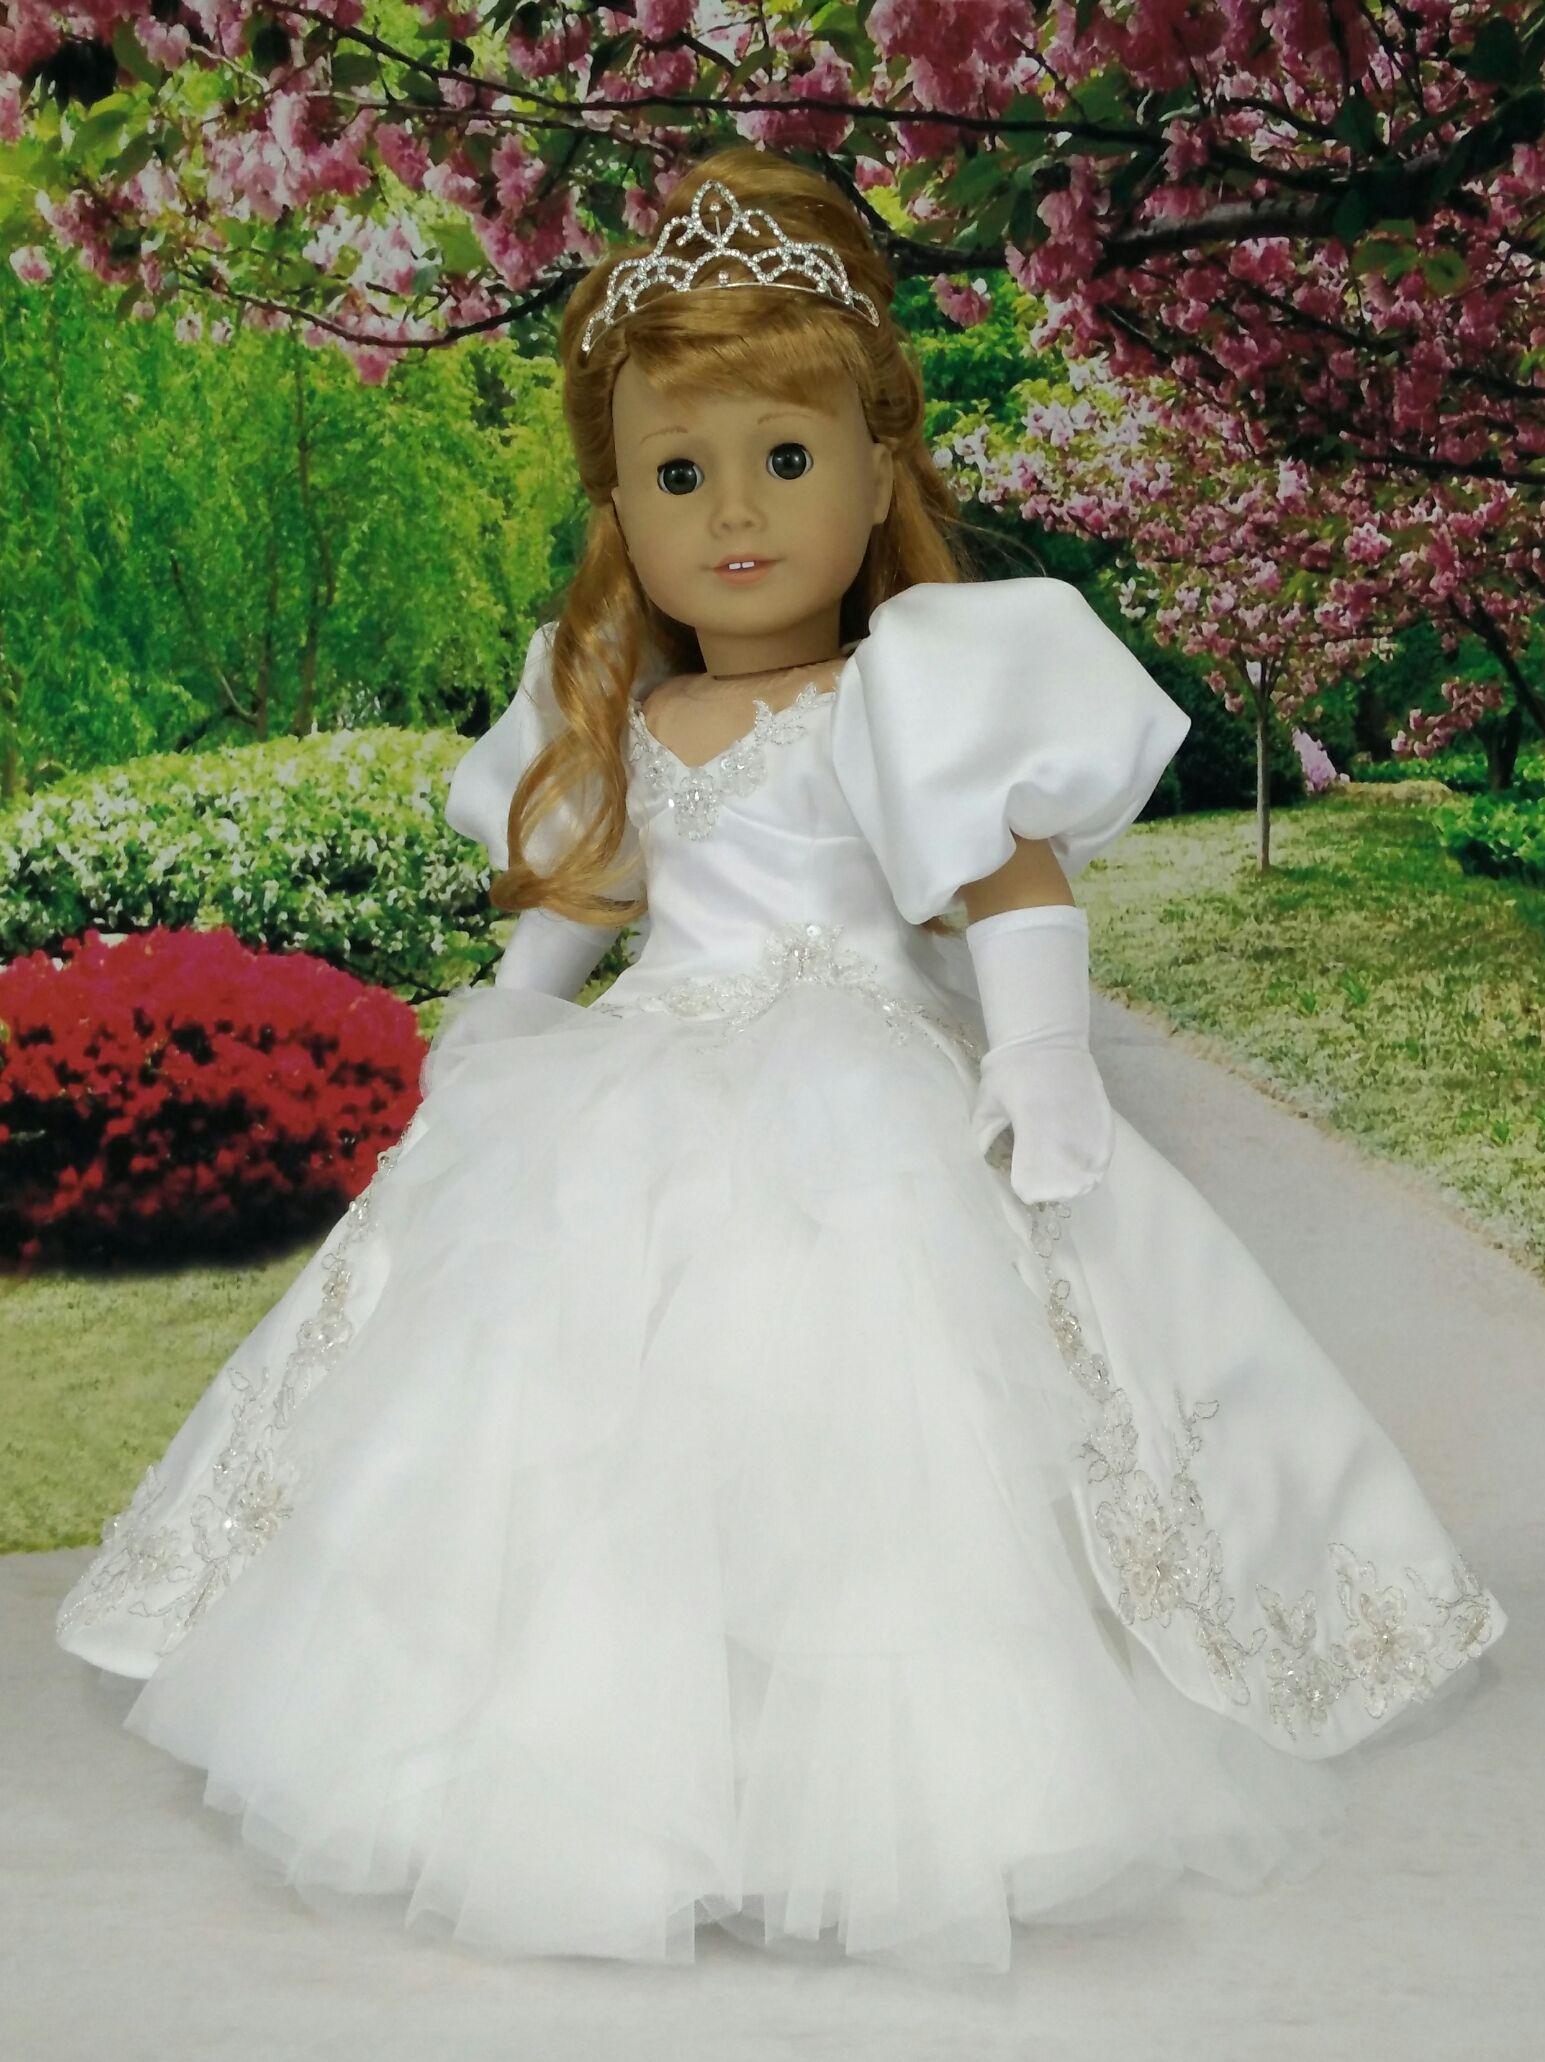 American Girl Doll Maryellen as Enchanted Princess Giselle wedding ...